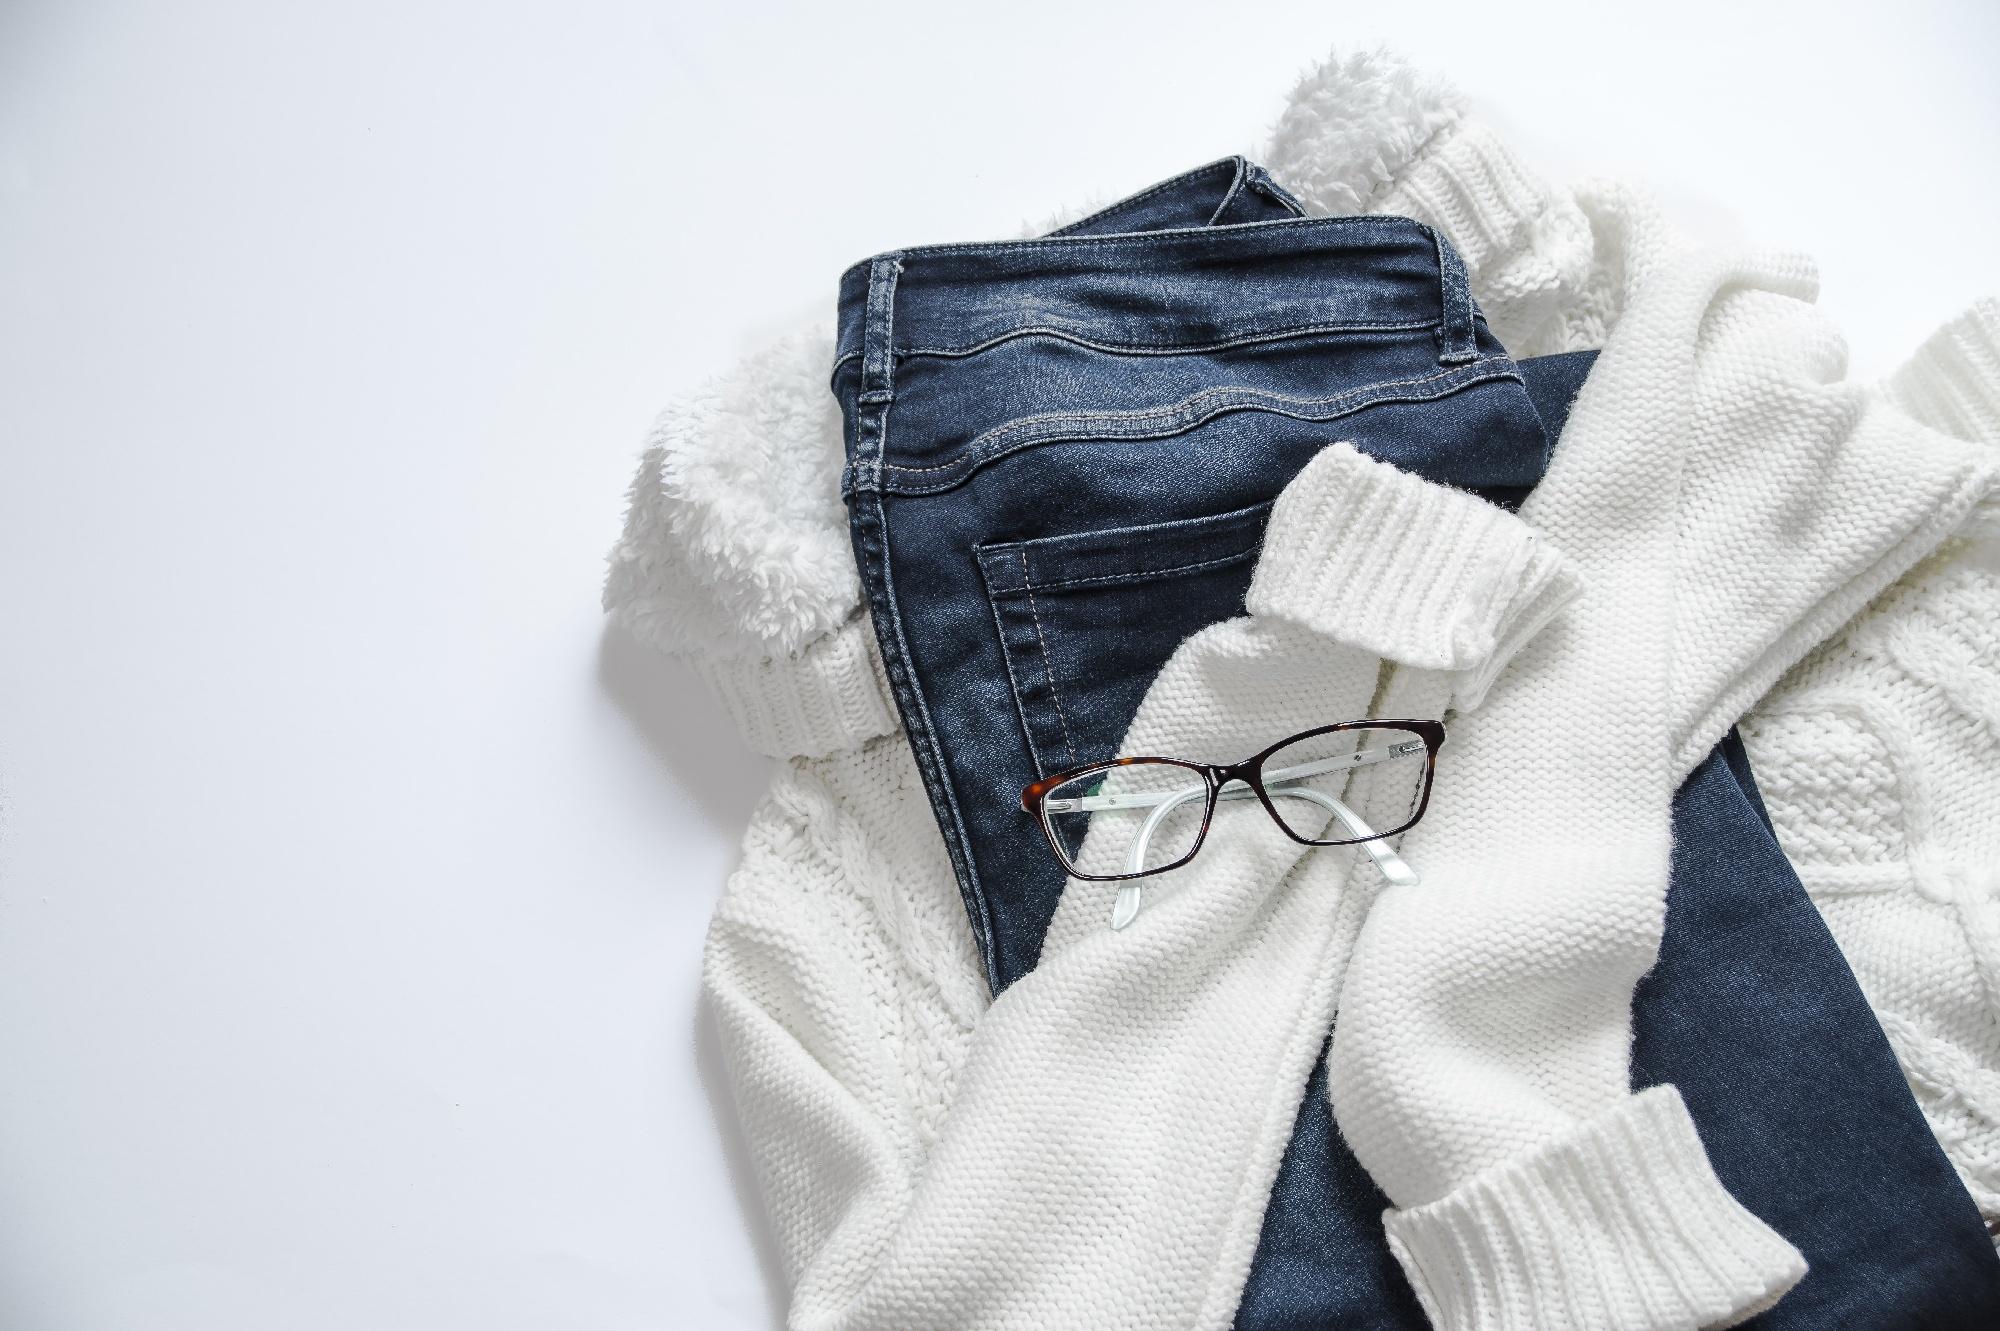 cashmere sweater and denim